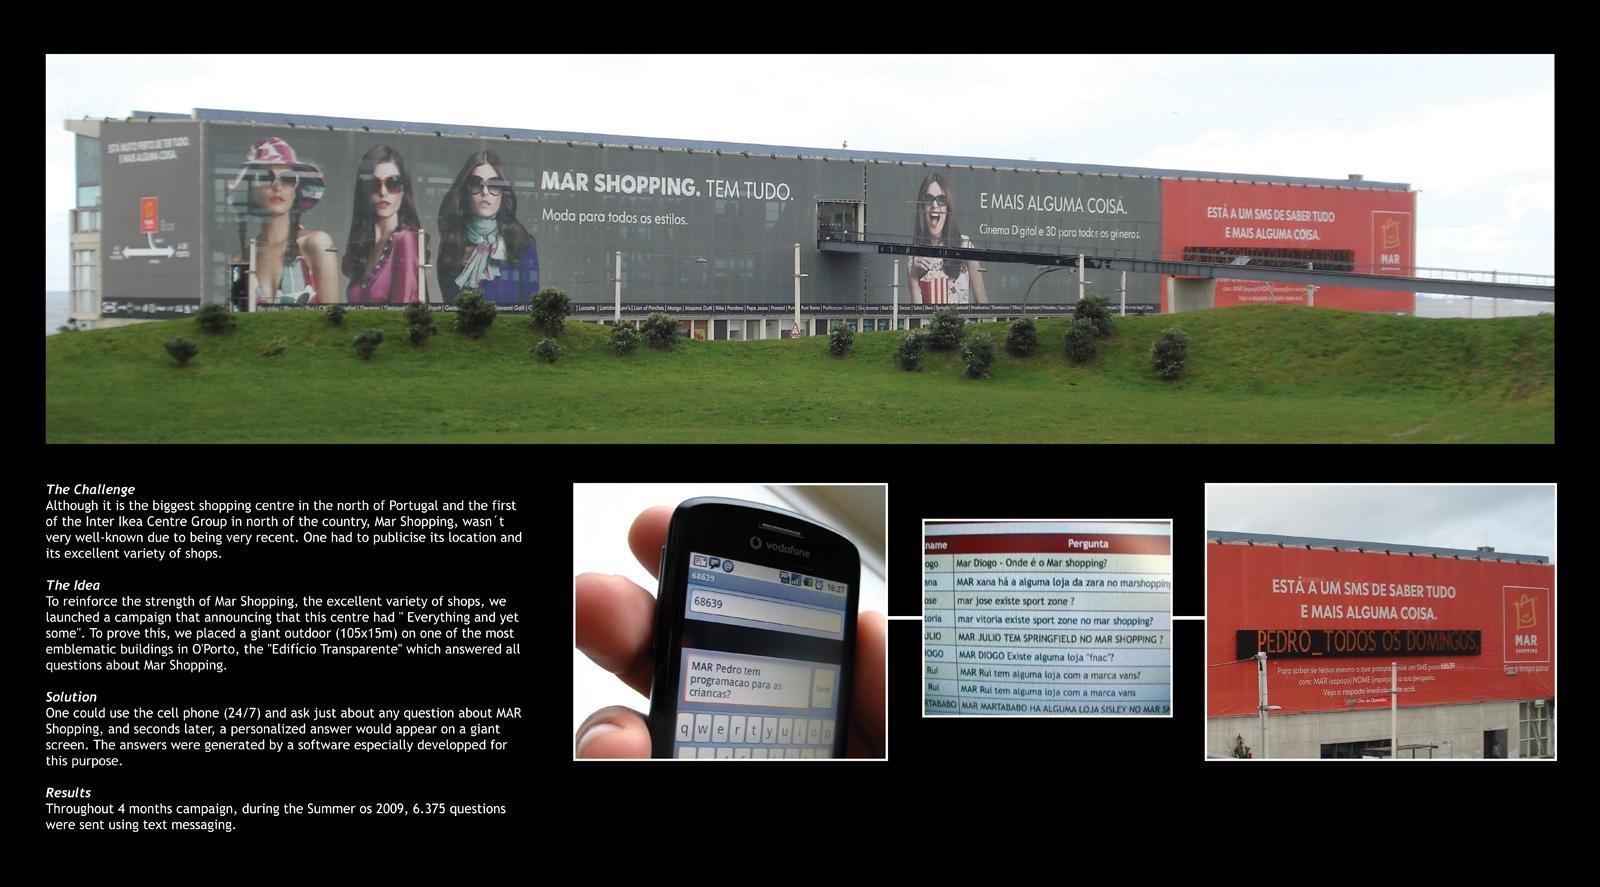 MAR Shopping Outdoor Ad -  Giant interactive outdoor